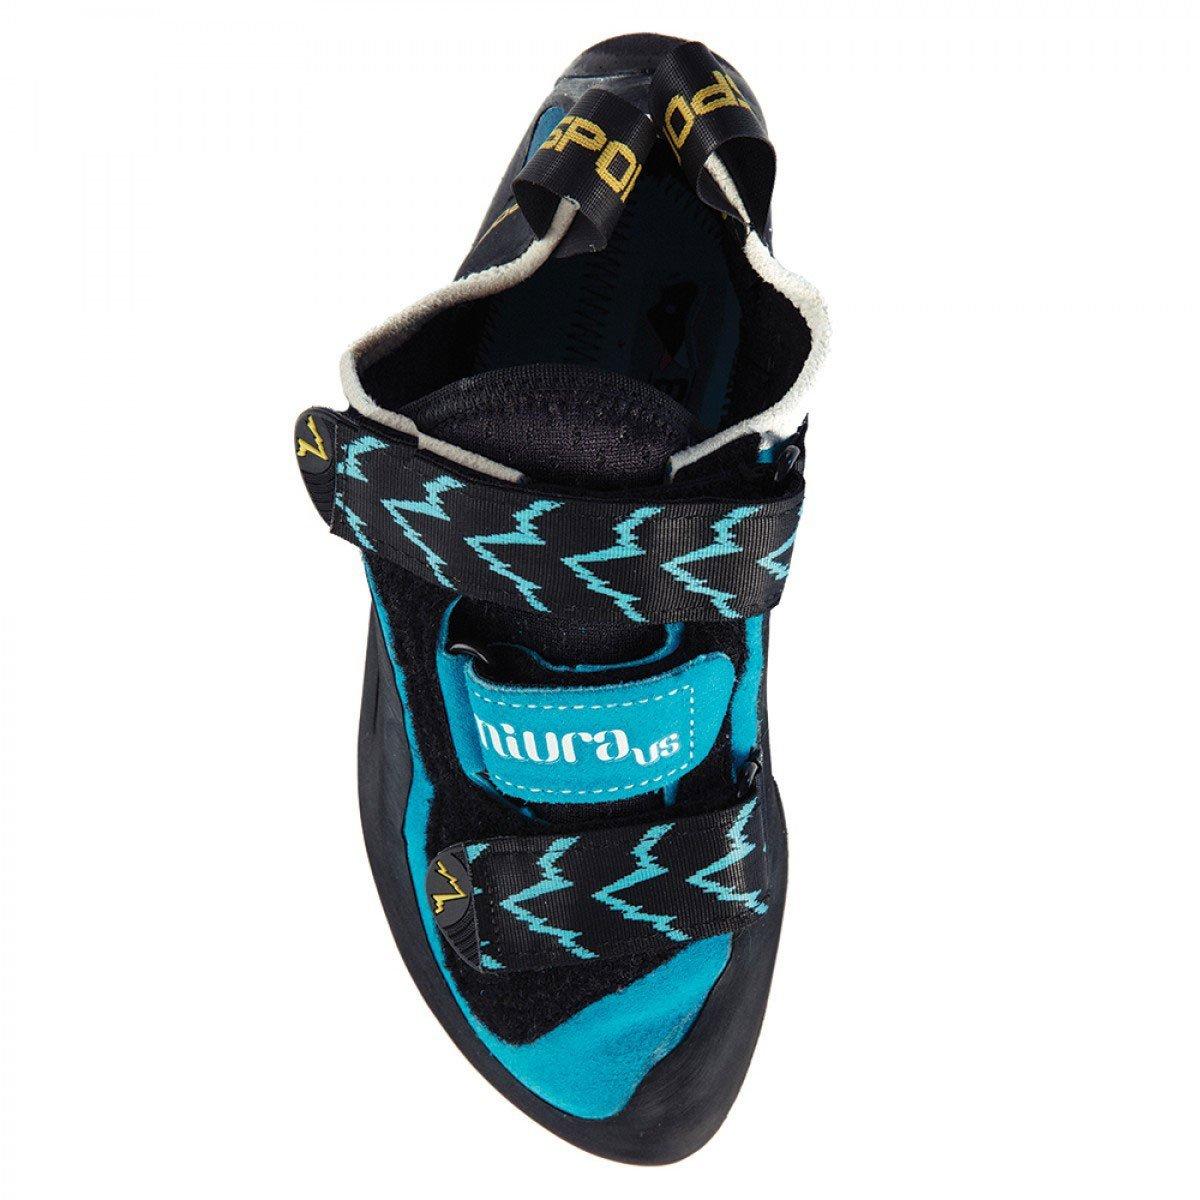 La Sportiva - Miura VS Climbing Shoe - Sportiva Women's B01B6JHX1M 41.5 M EU|Blue ea7895